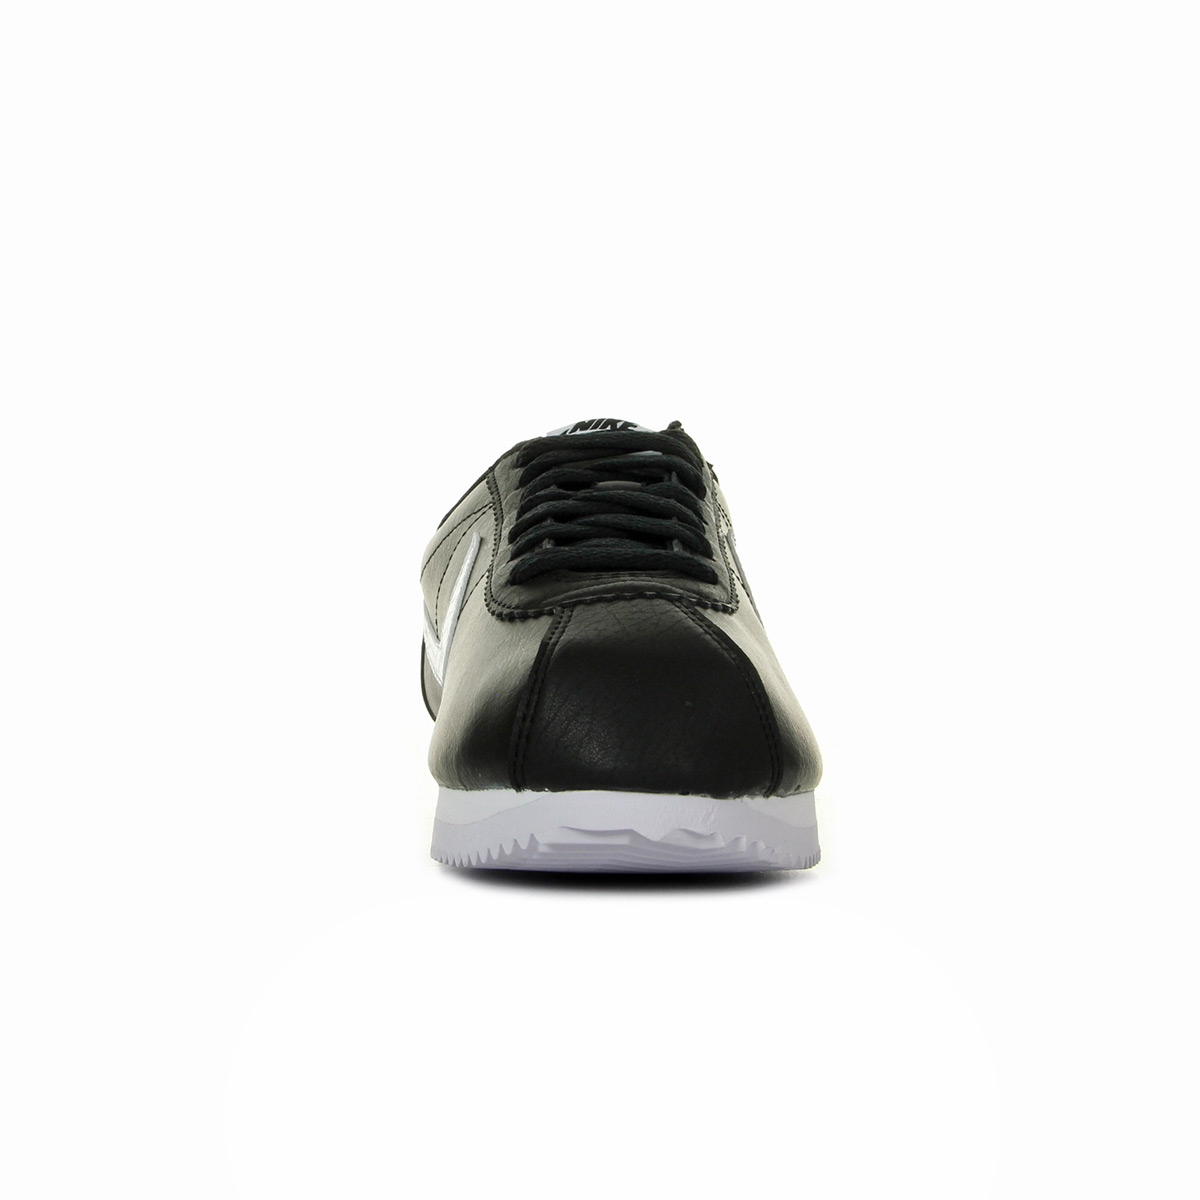 huge discount 01931 6bb92 ... Nike WMNS Classic Cortez Leather ...